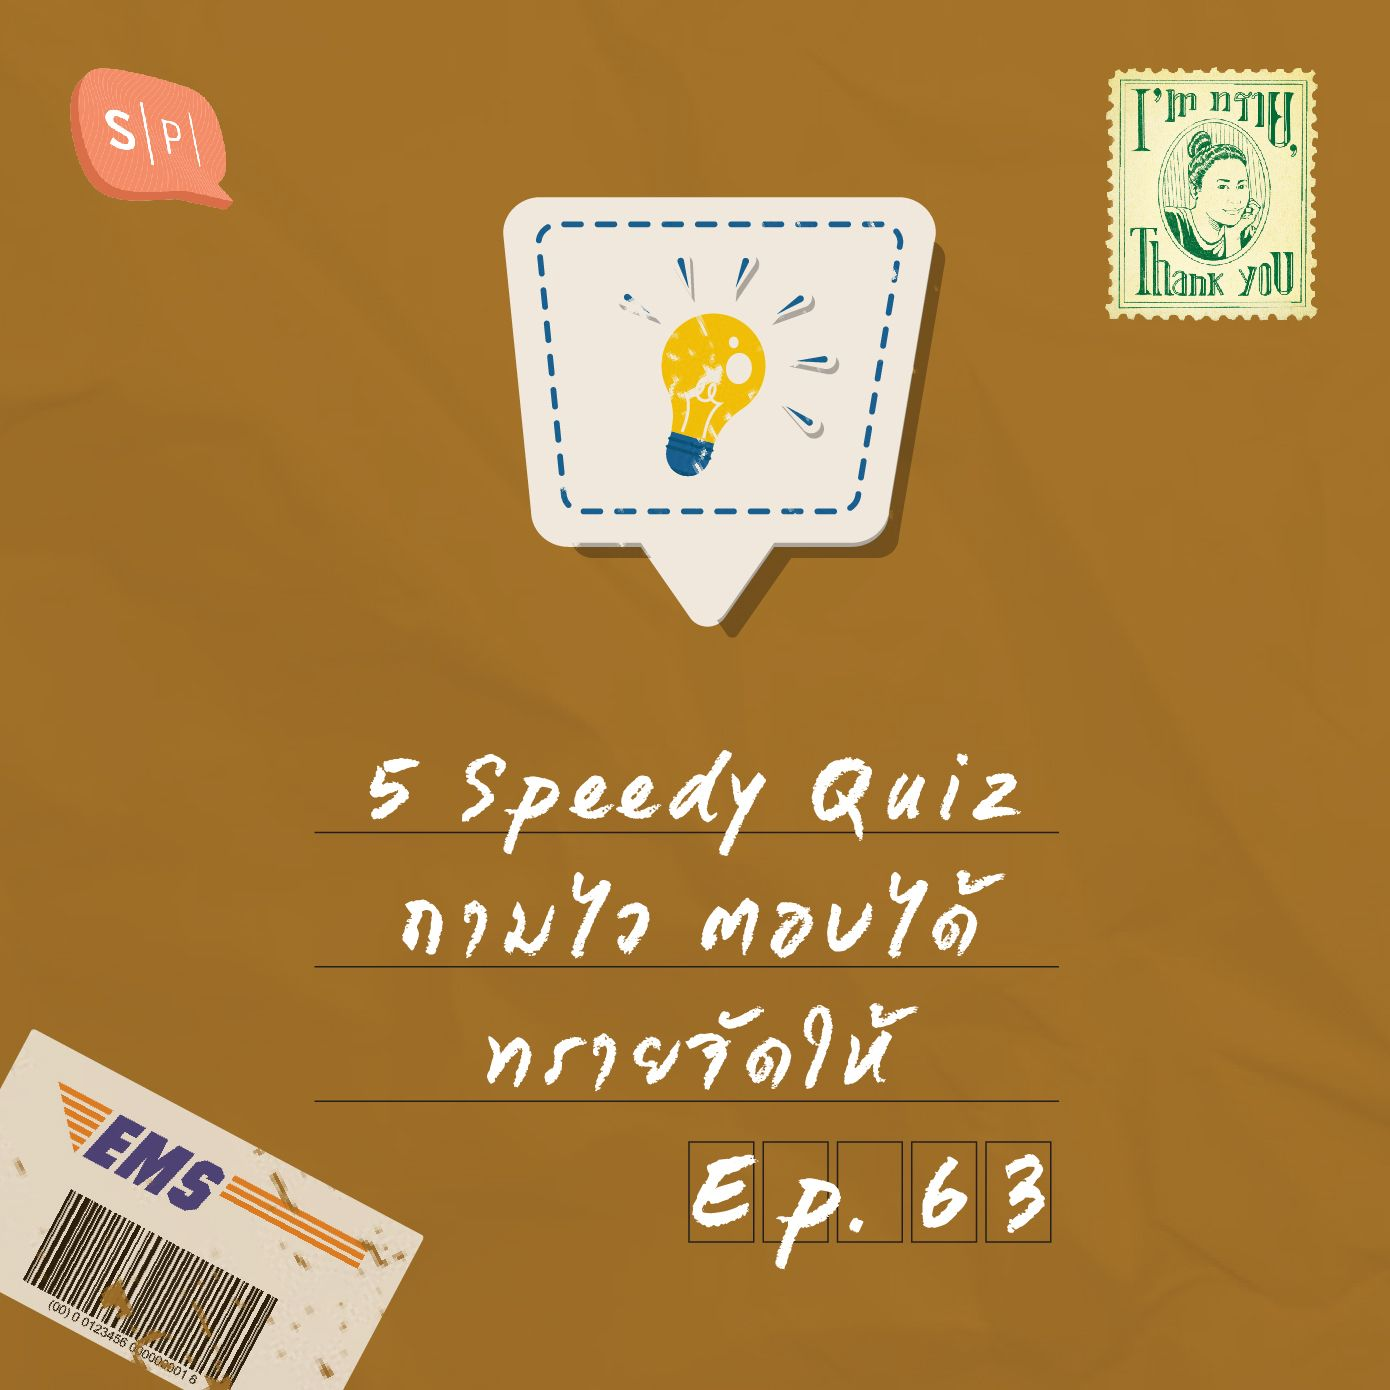 5 Speedy Quiz ถามไว ตอบได้ ทรายจัดให้ | I'm ทราย, Thank You EP63